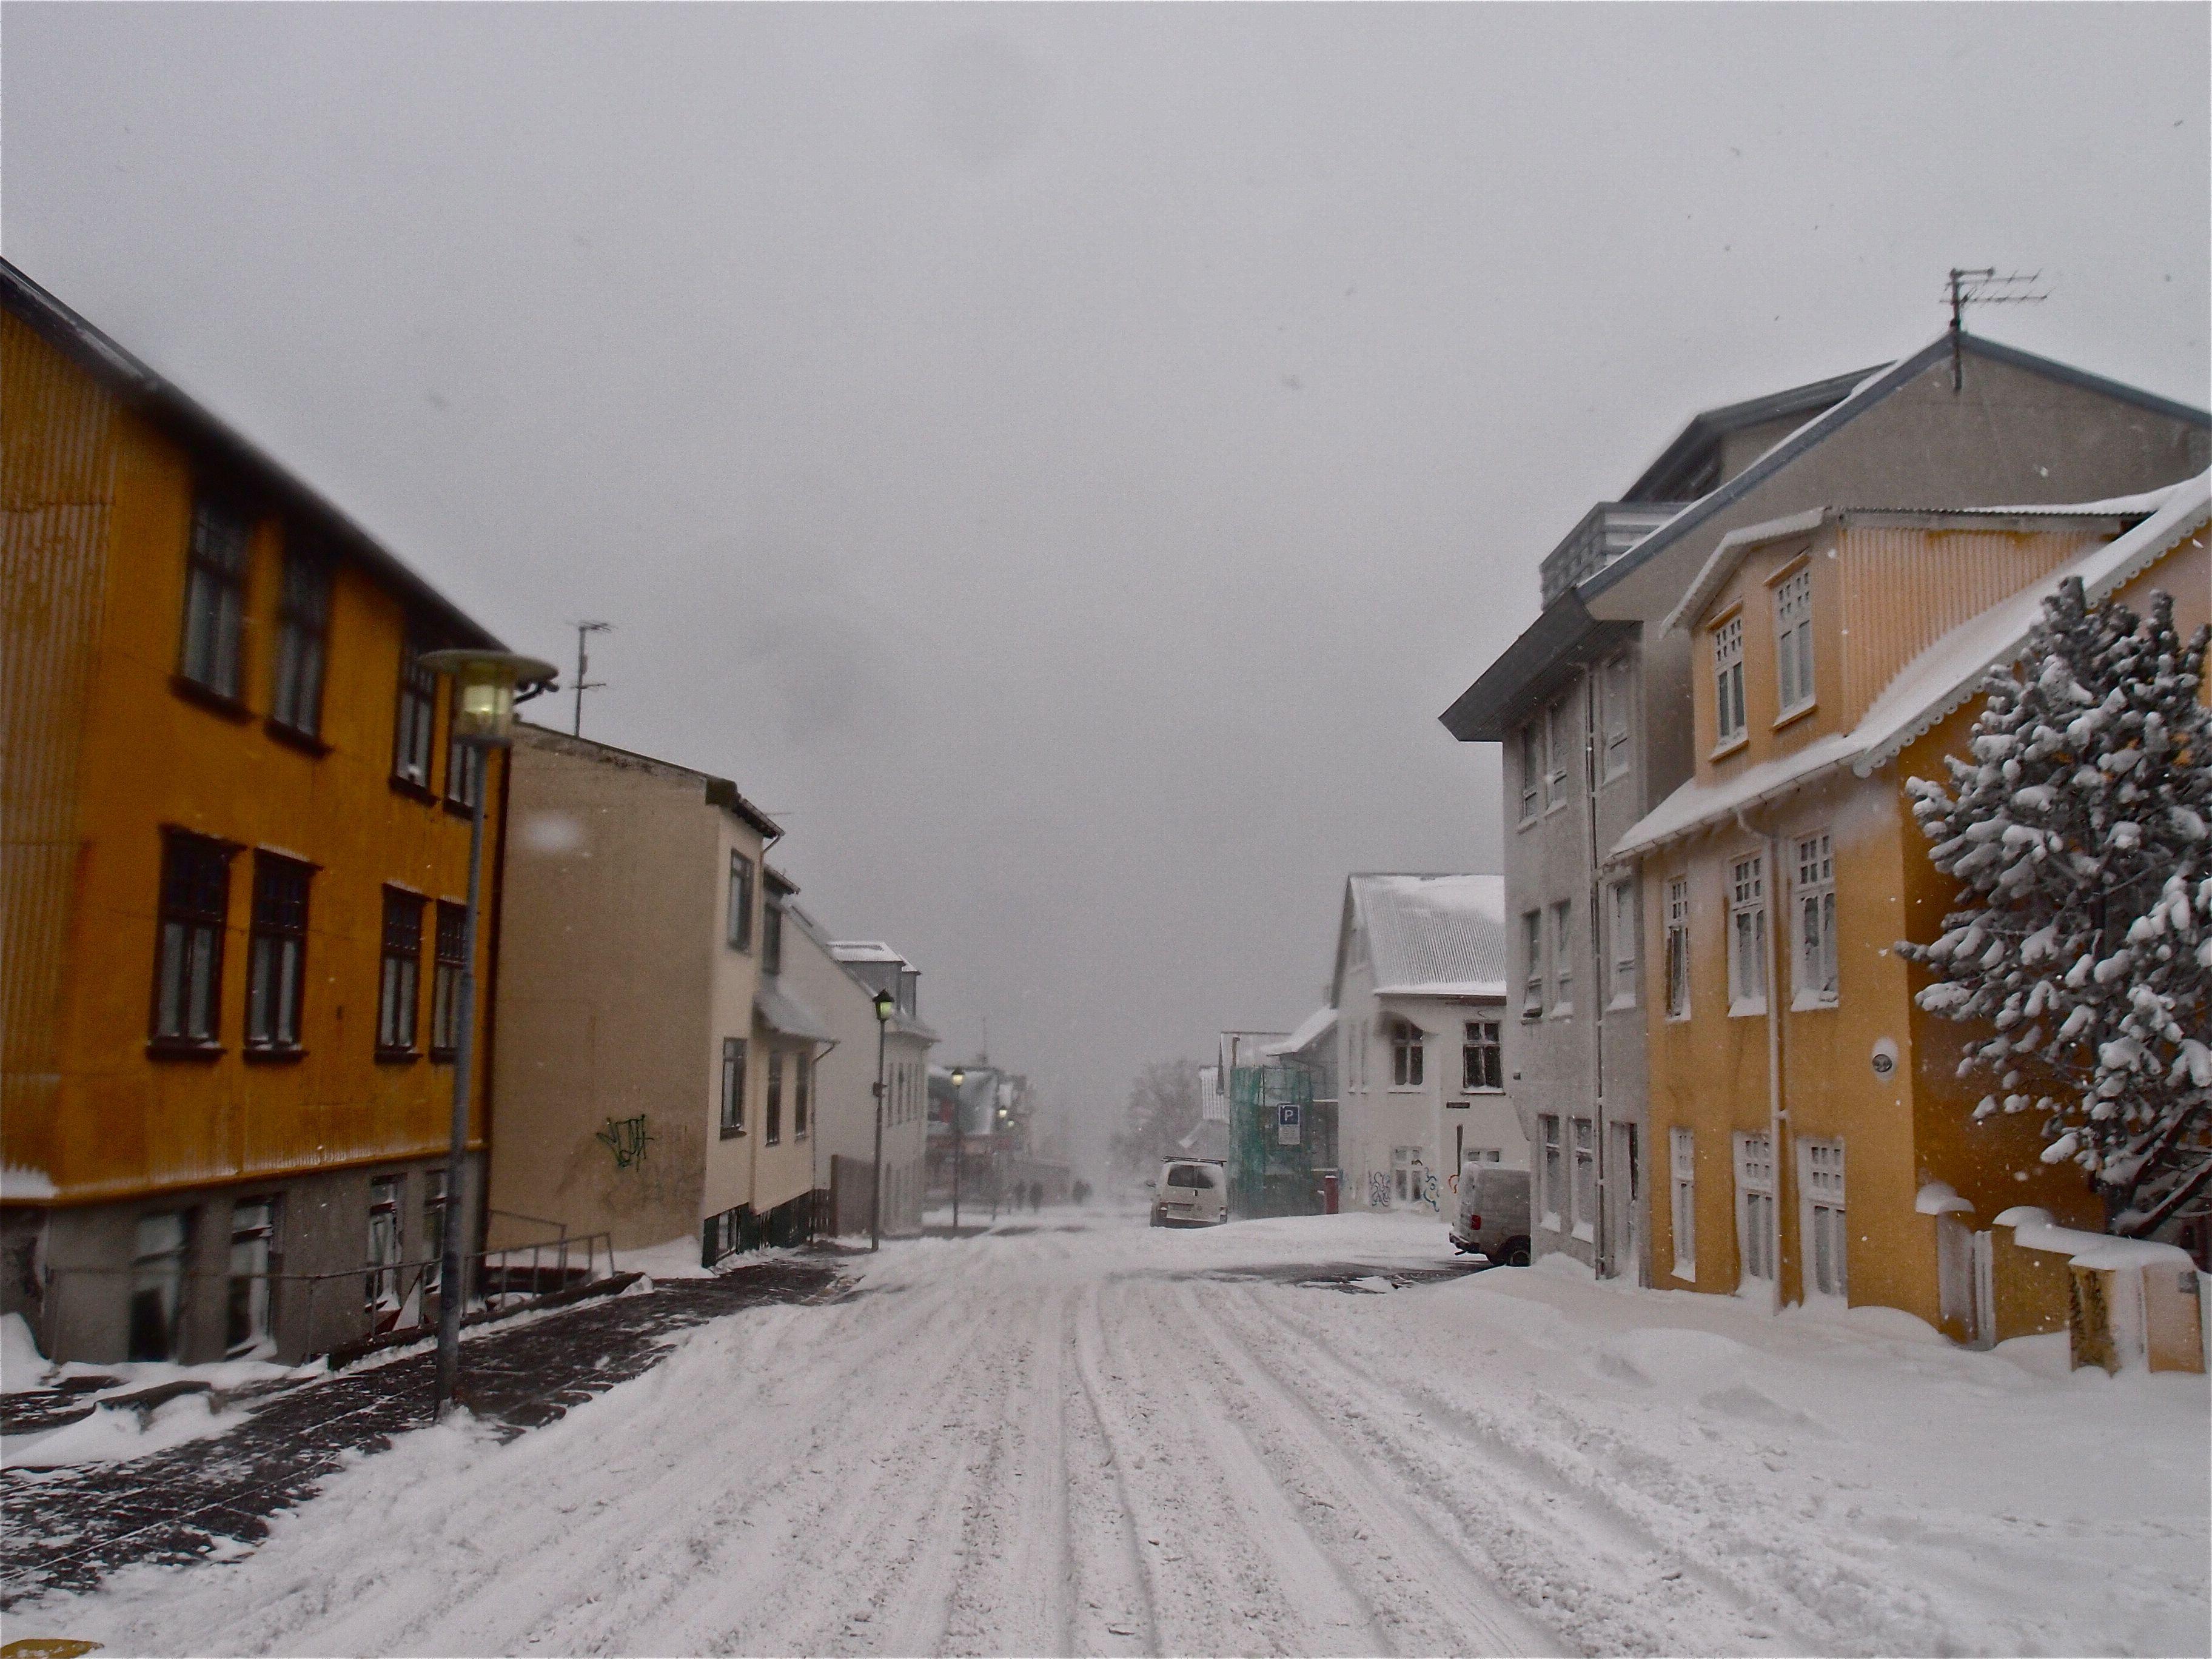 Reykjavik streets covered in snow! Icelandic design